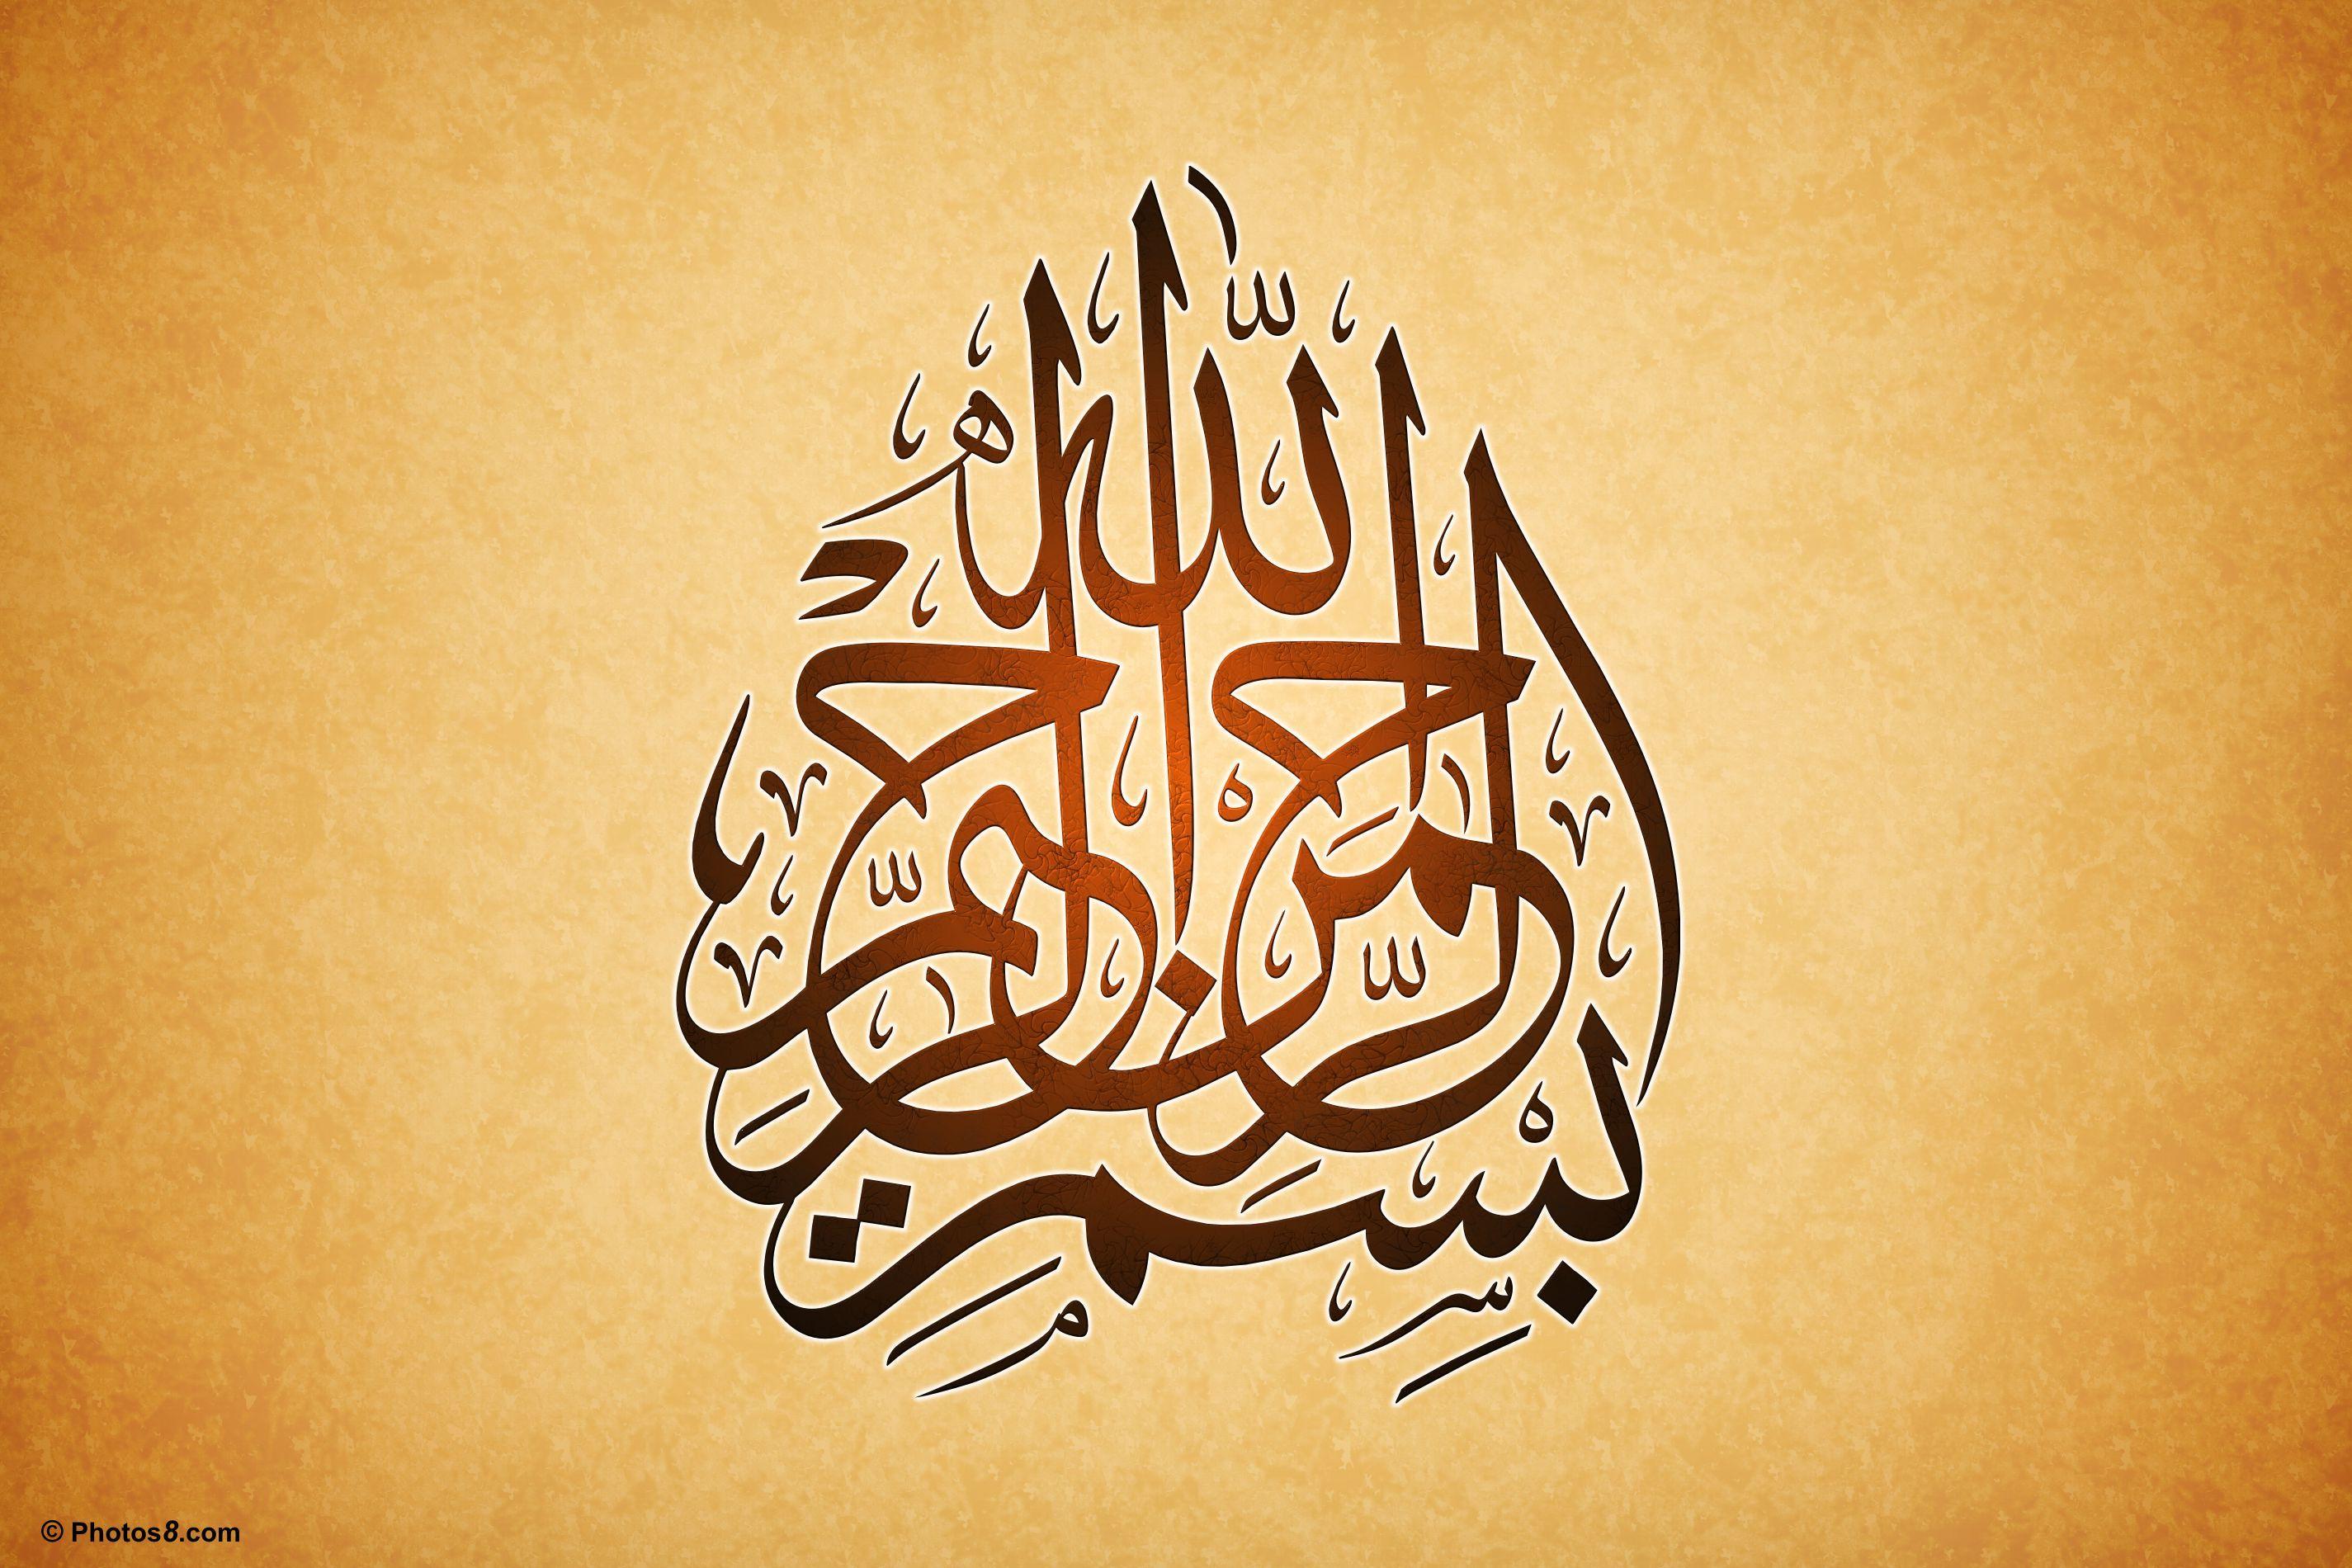 Besmele | Hat | Pinterest | Islamic calligraphy, Calligraphy and Islamic